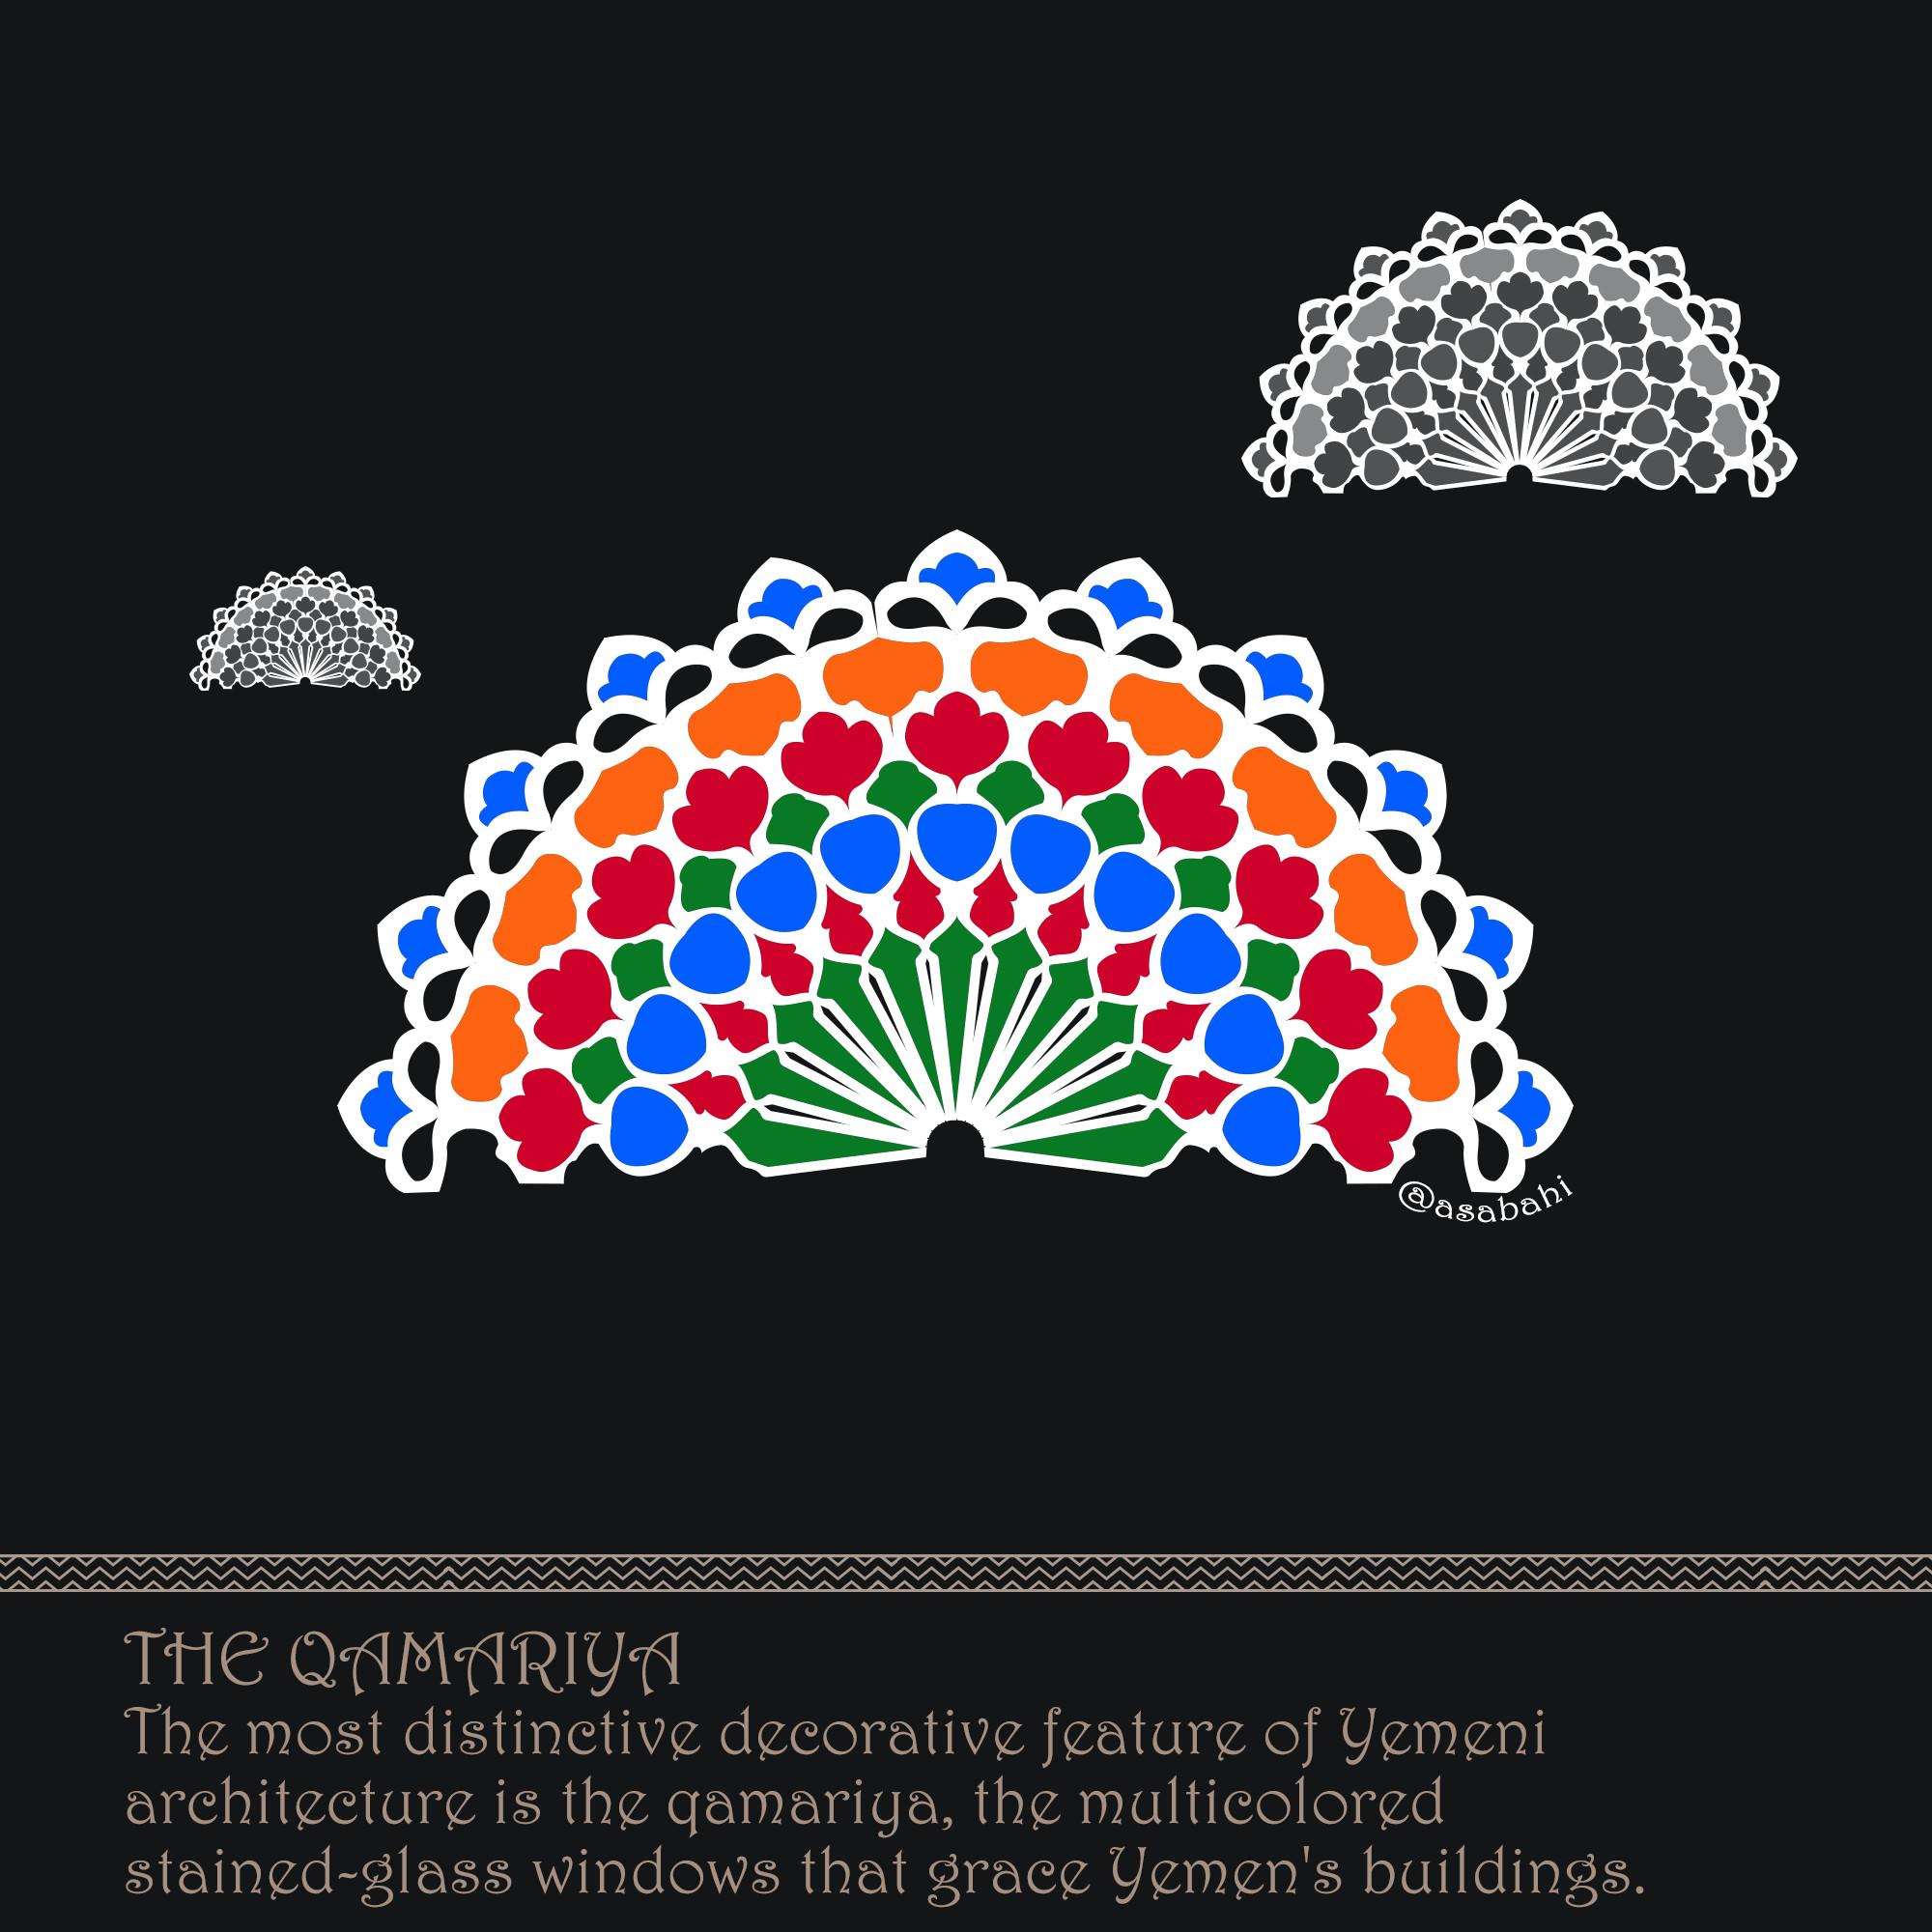 The Qamariya The most distinctive decorative feature of Yemeni architecture is the qamariya, the multicolored stained-glass windows that grace Yemen's buildings.